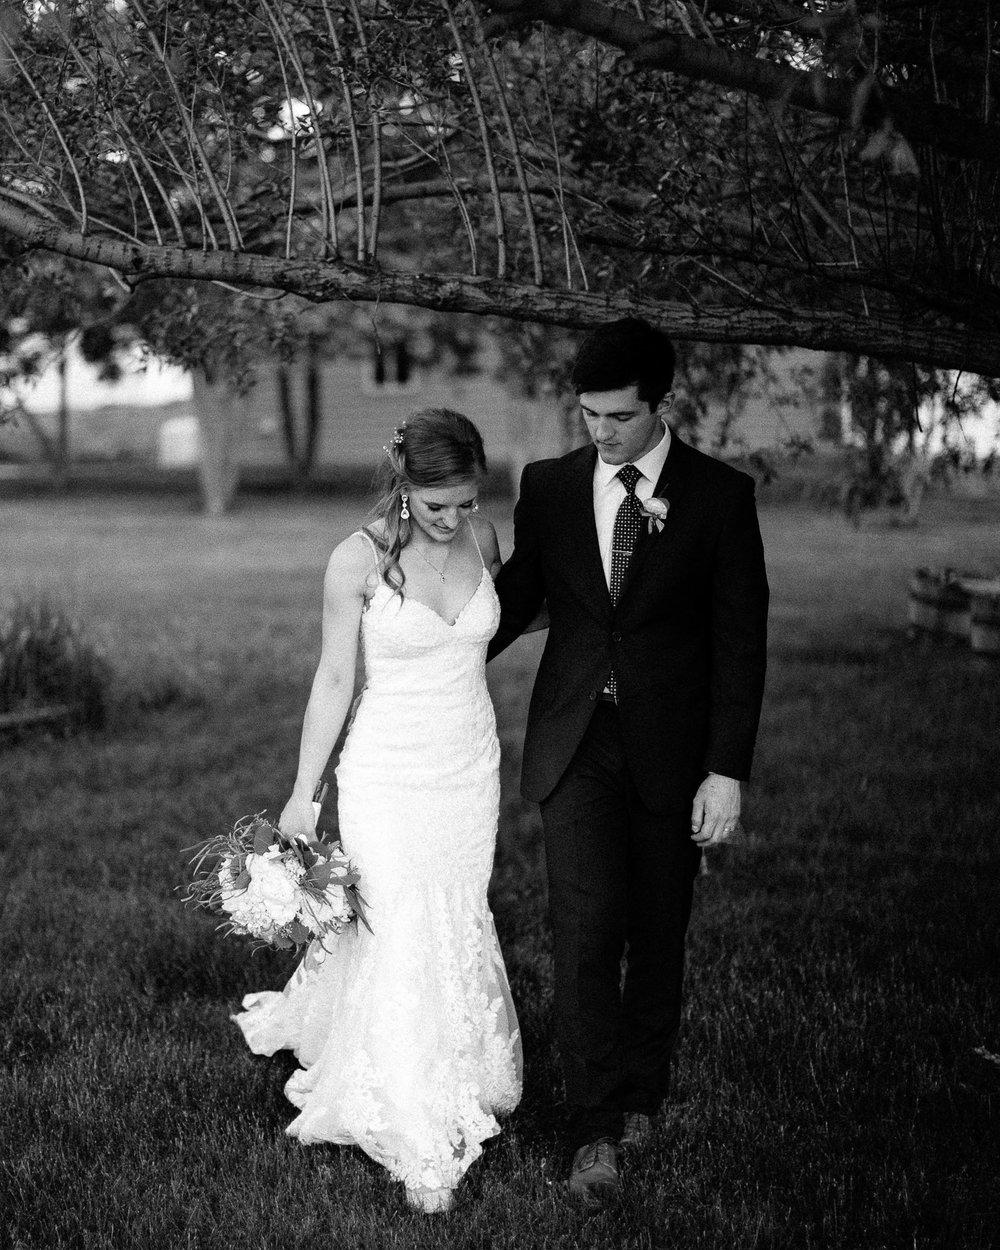 wedding-elopement-adventerous-romantic-timeless-south-dakota-blue-haven-barn-083.jpg